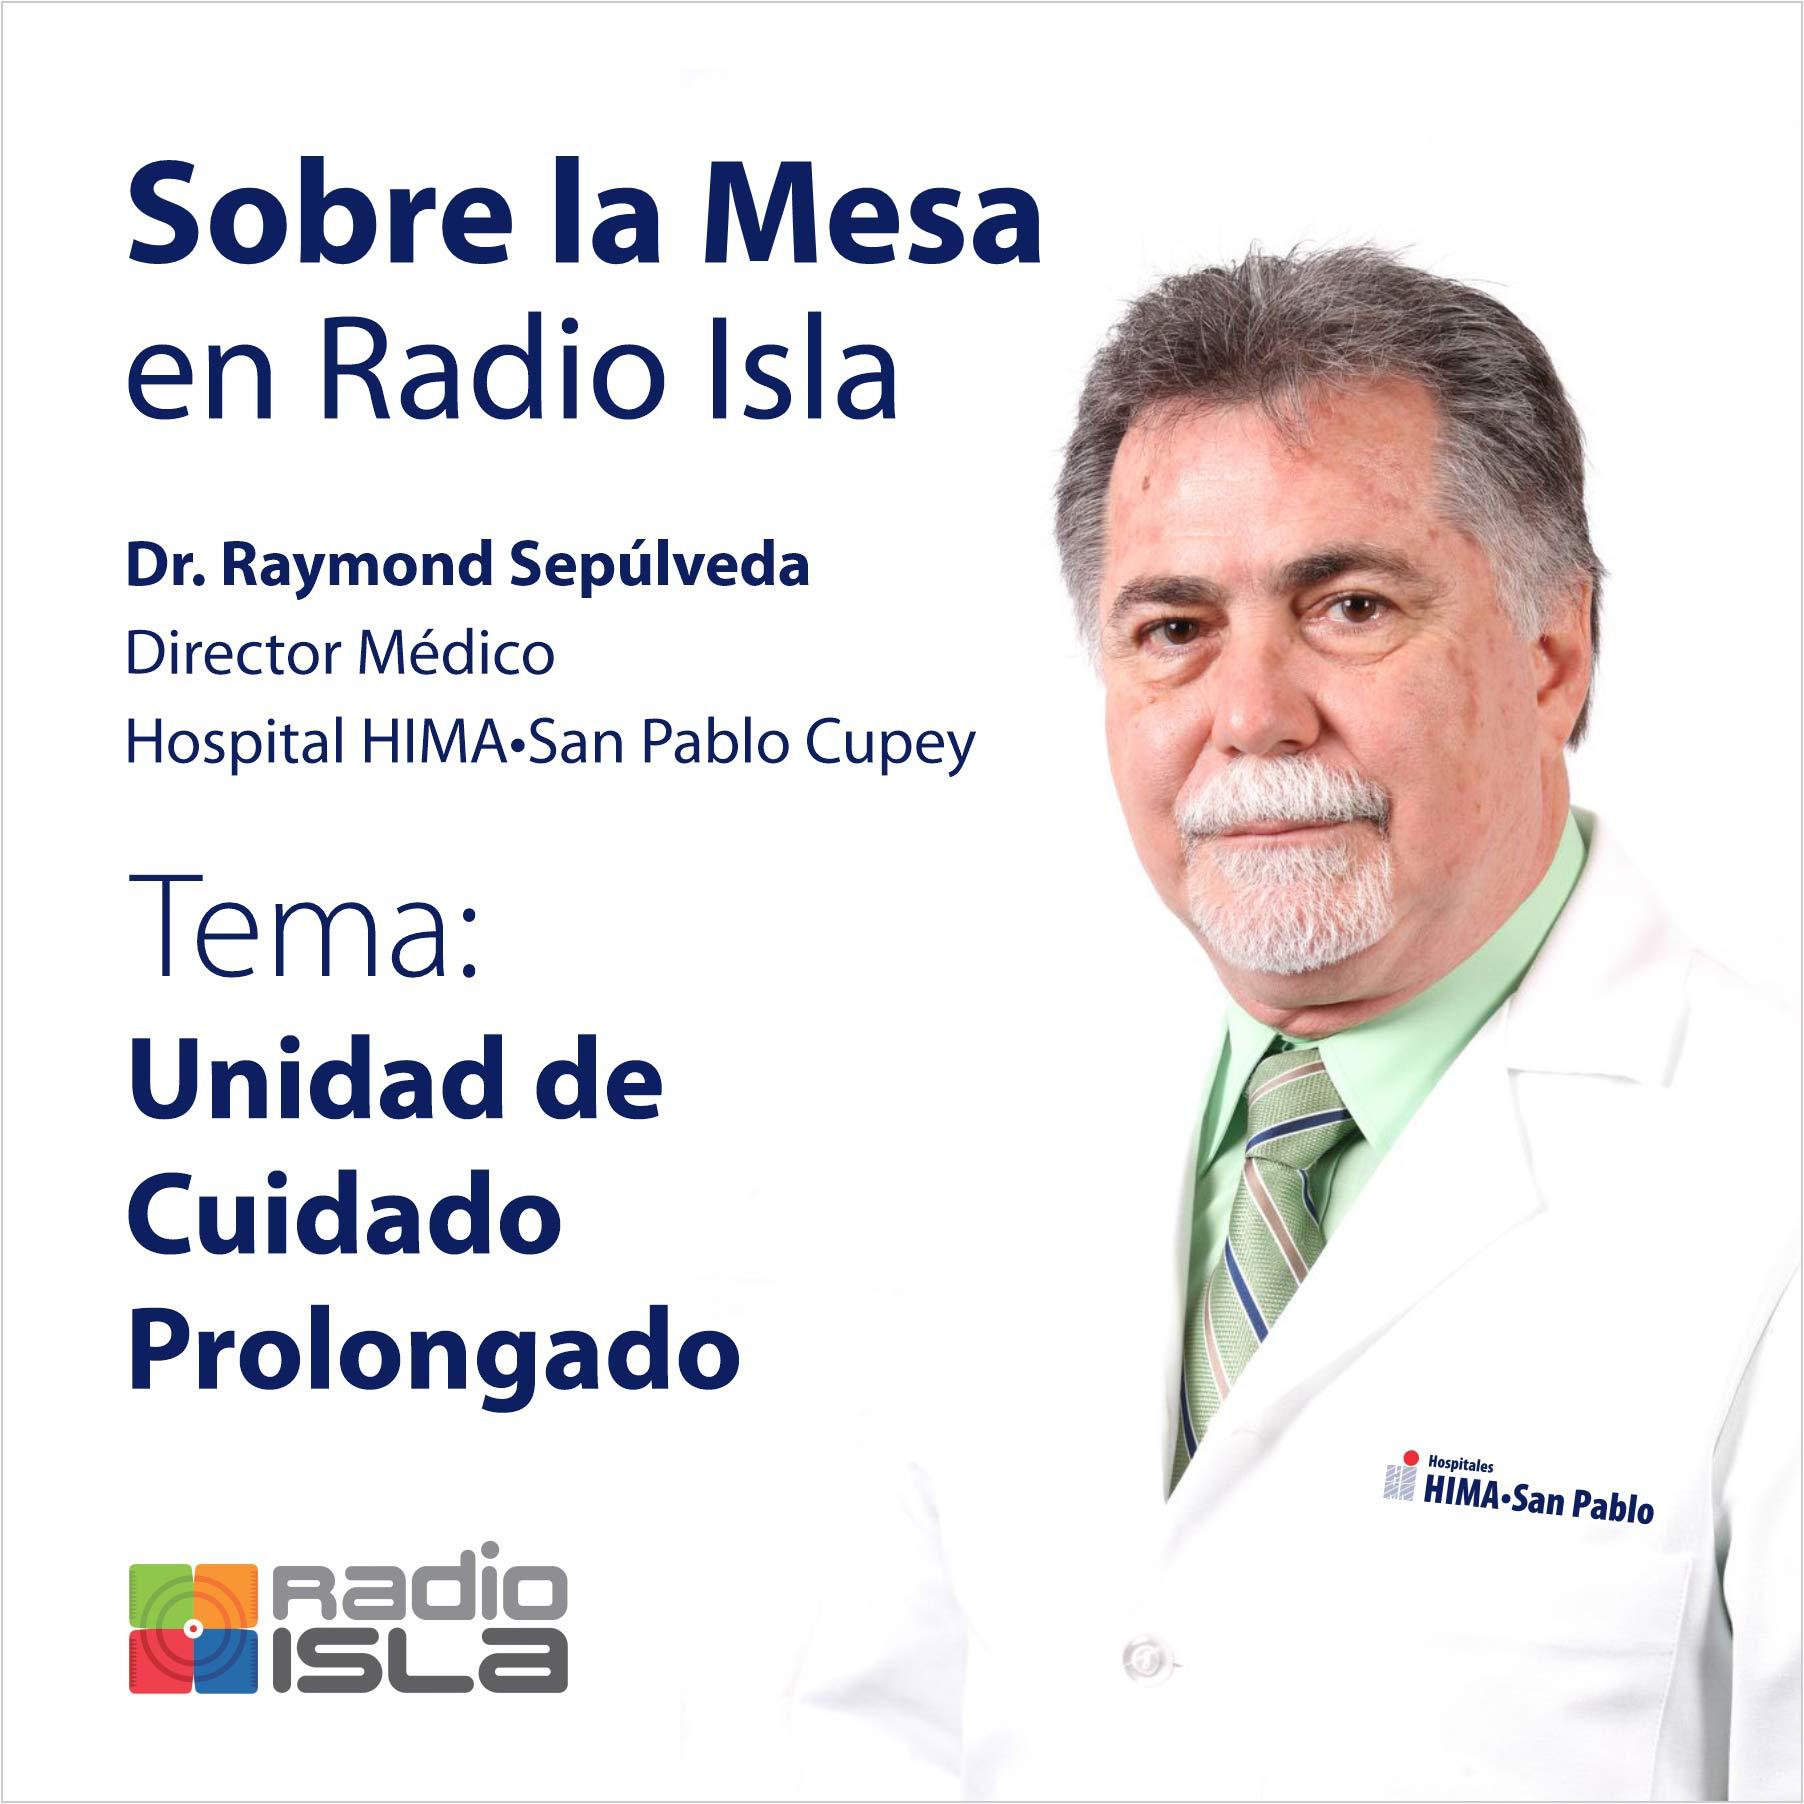 Dr-Raymond-Sepulveda-por-Radio-Isla-small